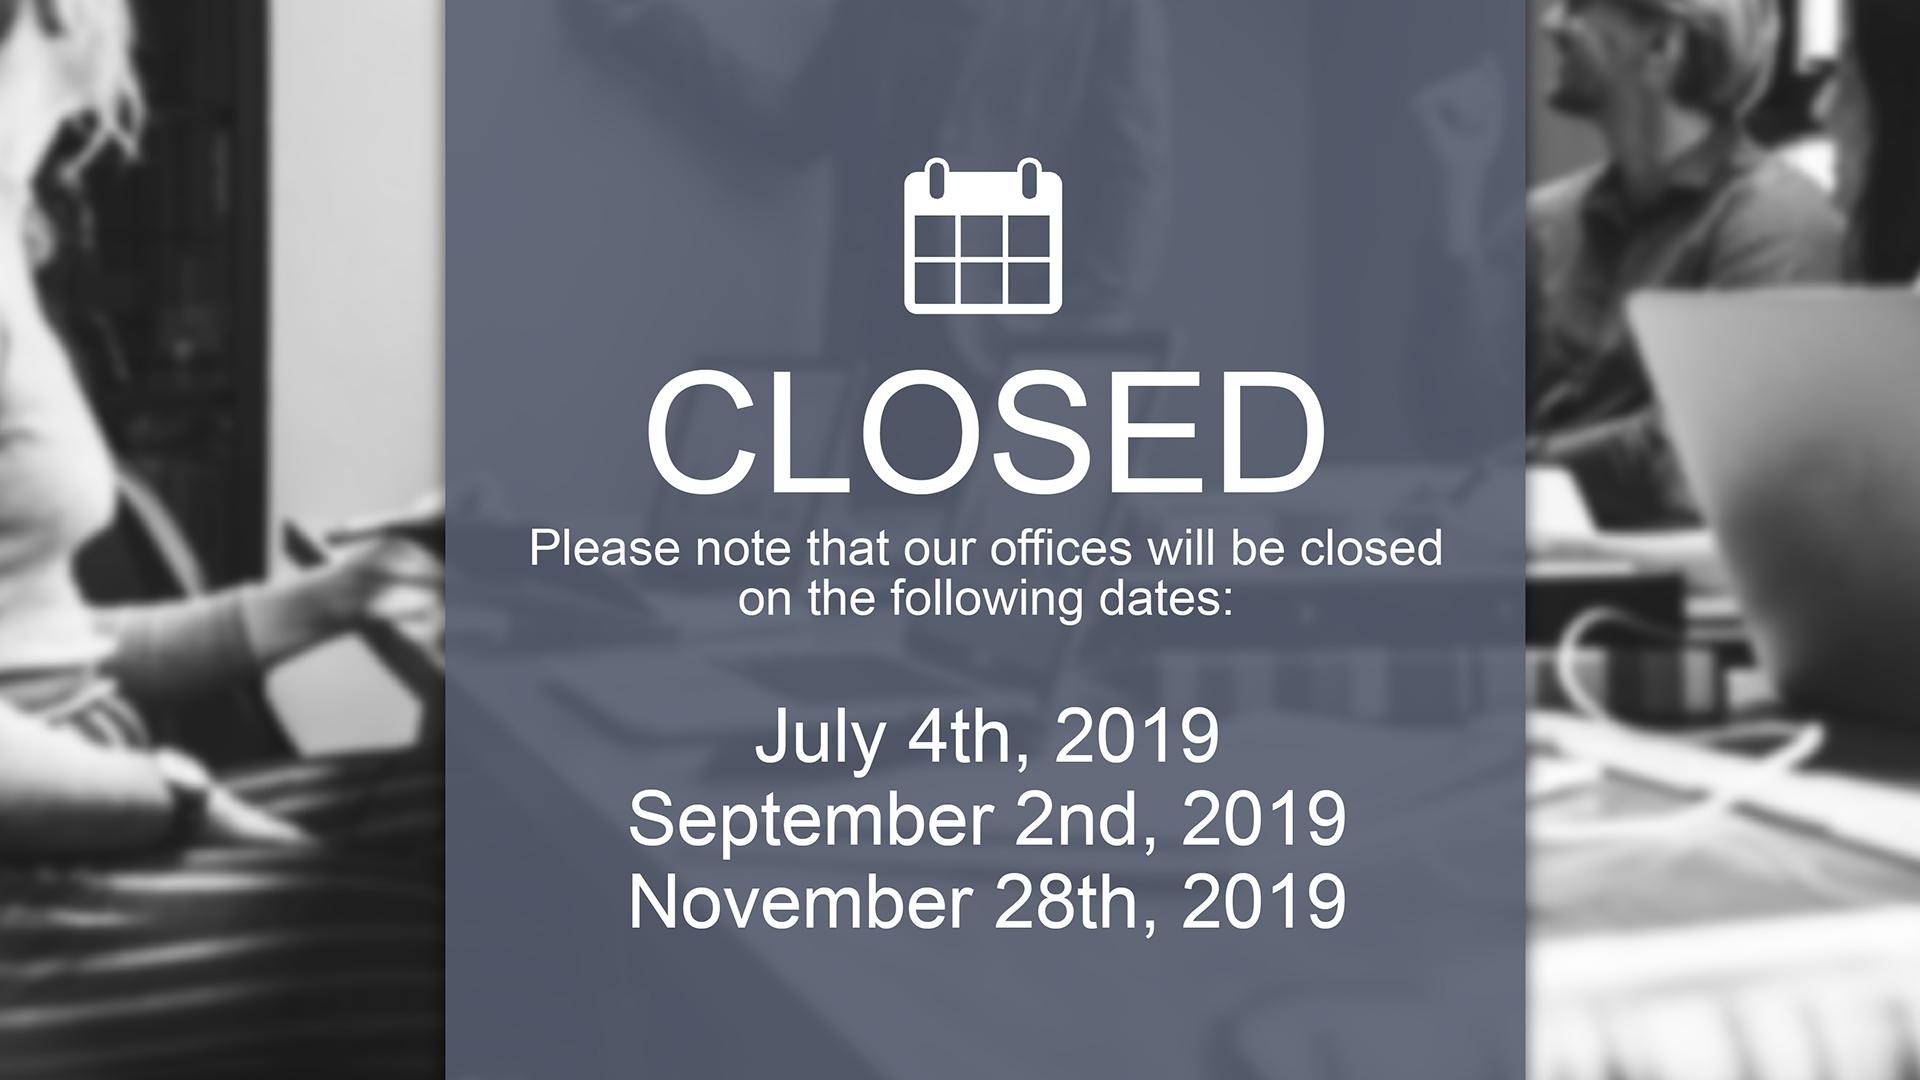 Carousel Digital Signage - Office Closures